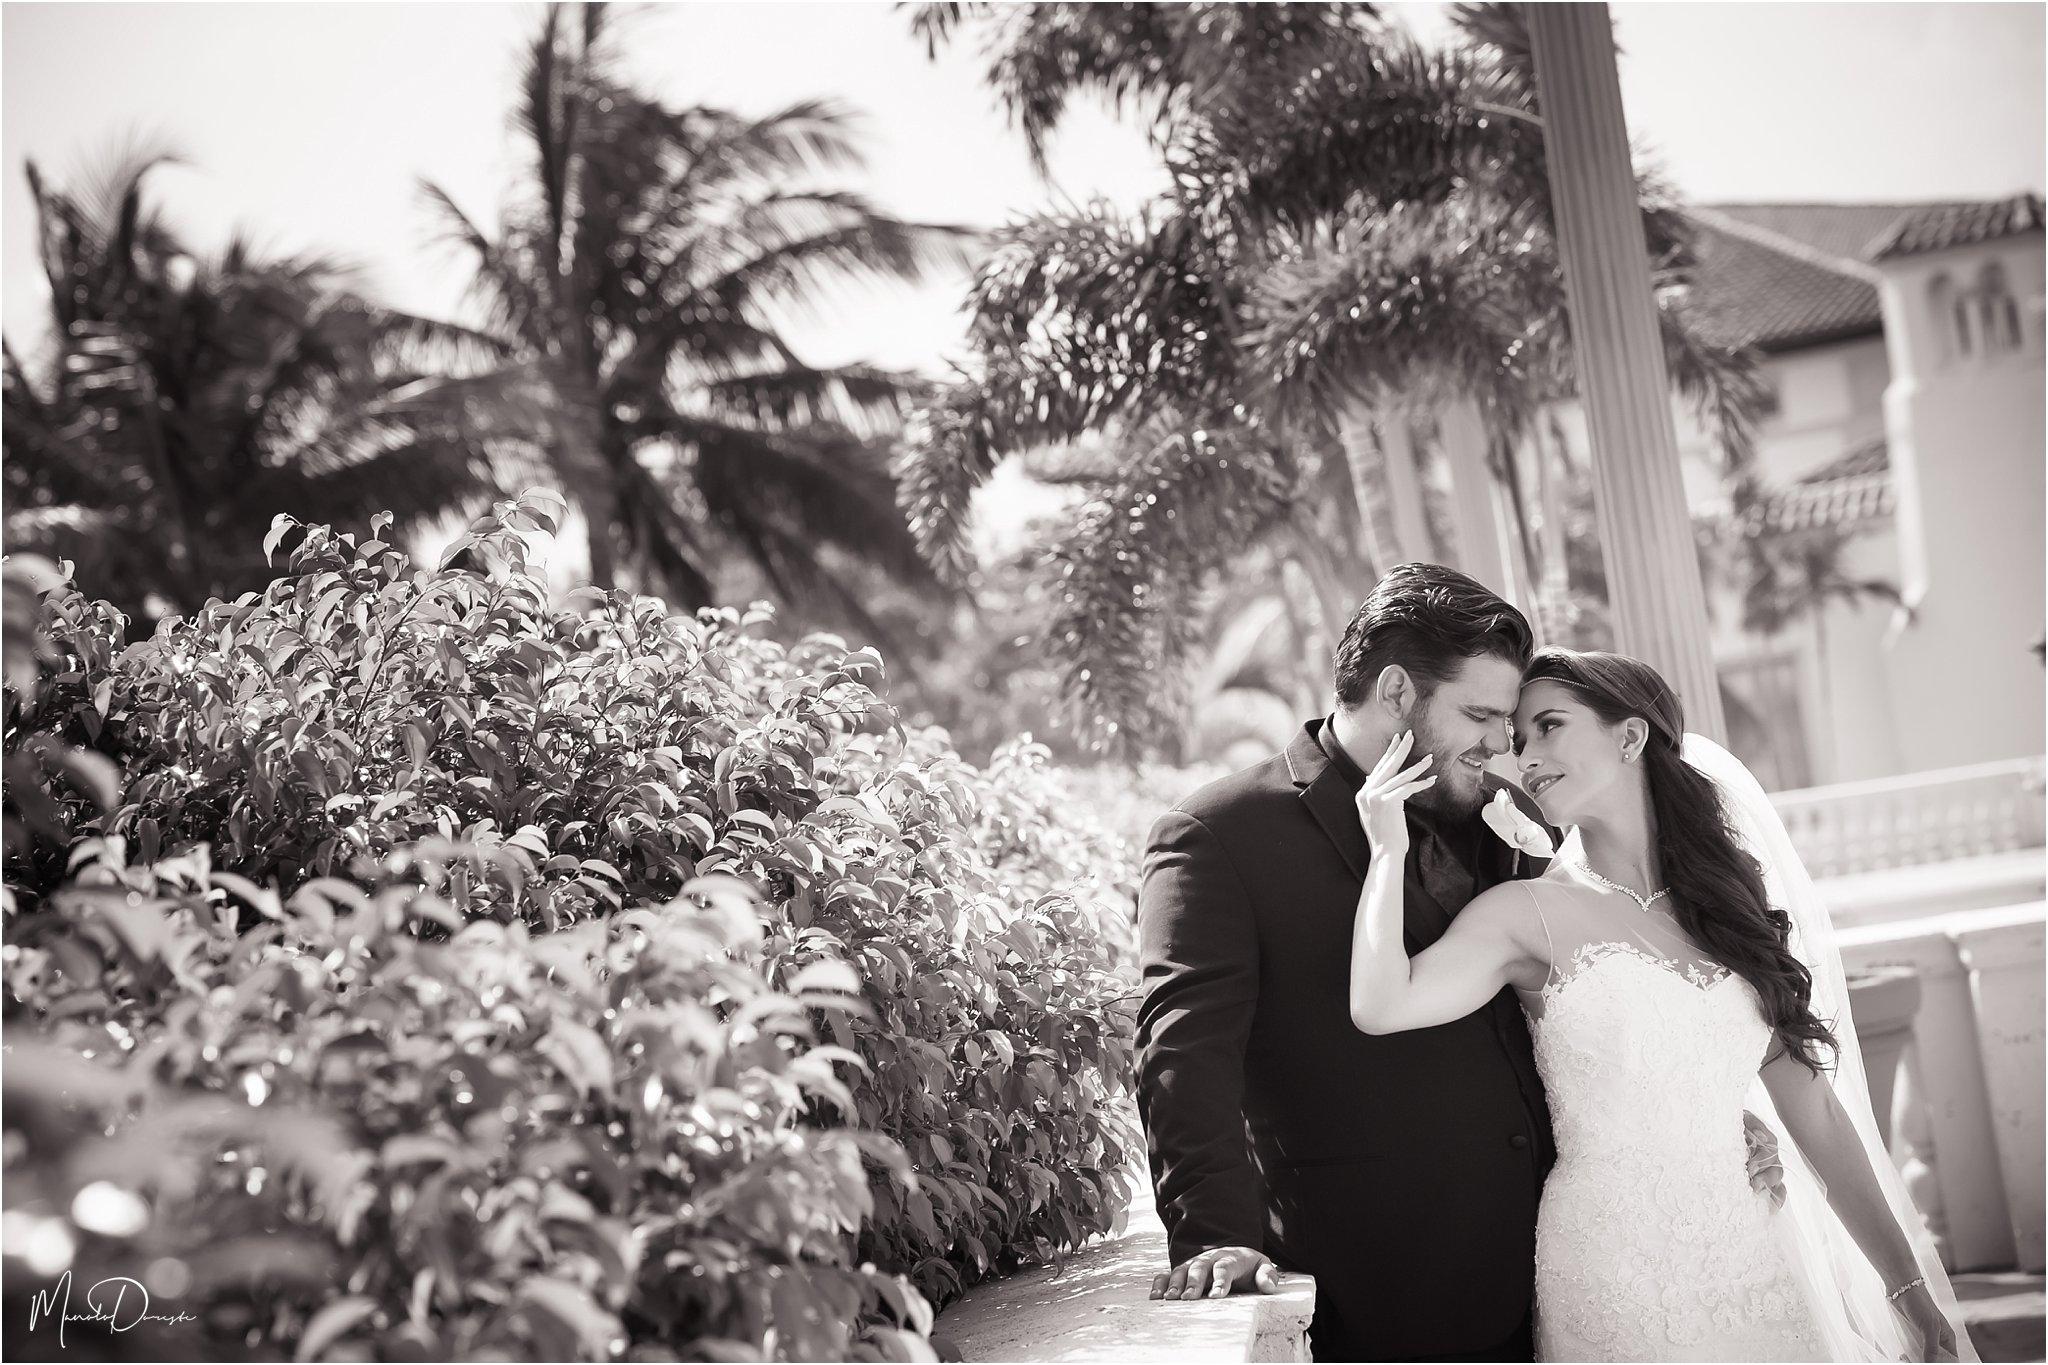 0160_ManoloDoreste_InFocusStudios_Wedding_Family_Photography_Miami_MiamiPhotographer.jpg